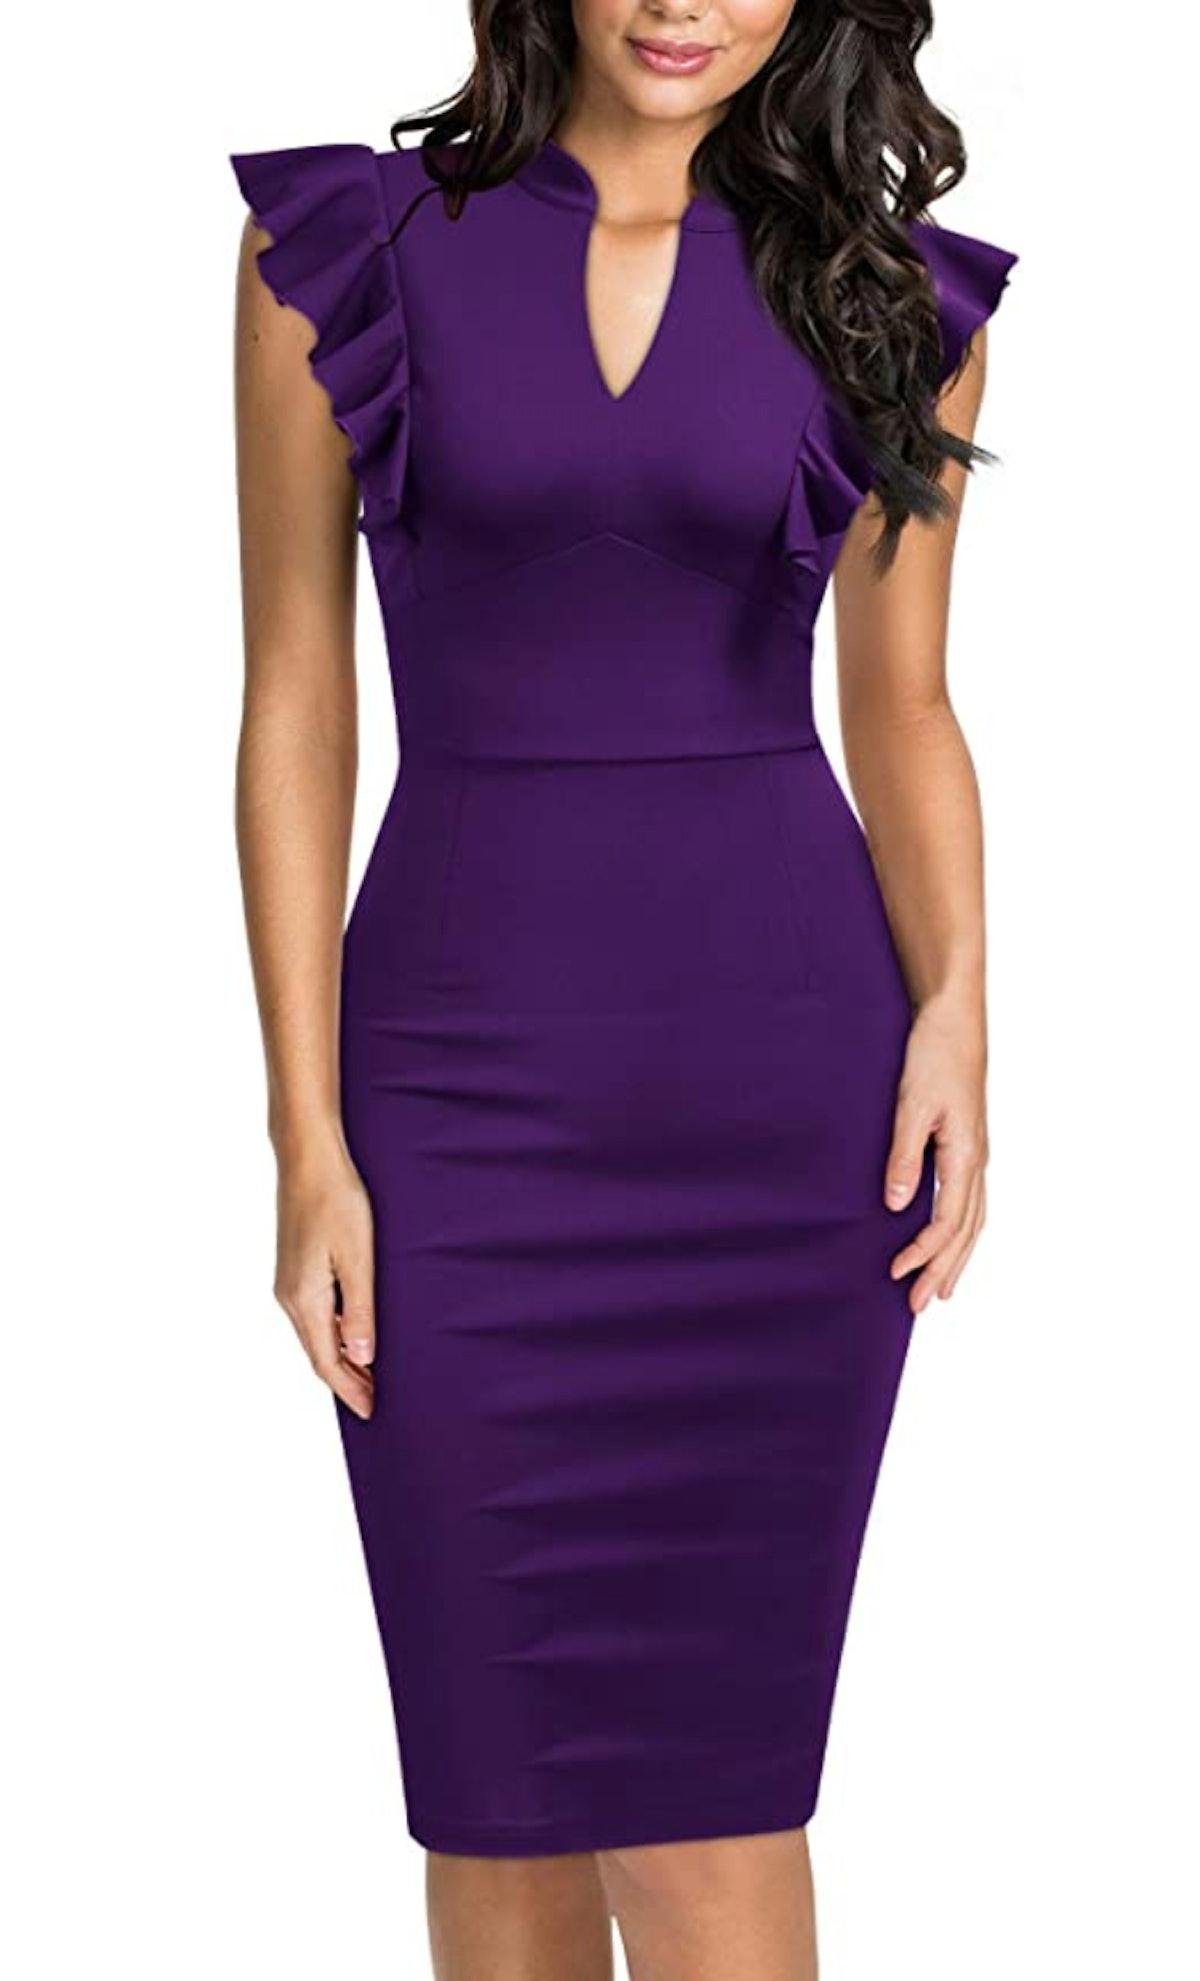 Knitee Purple V-Neck Bodycon Evening Dress